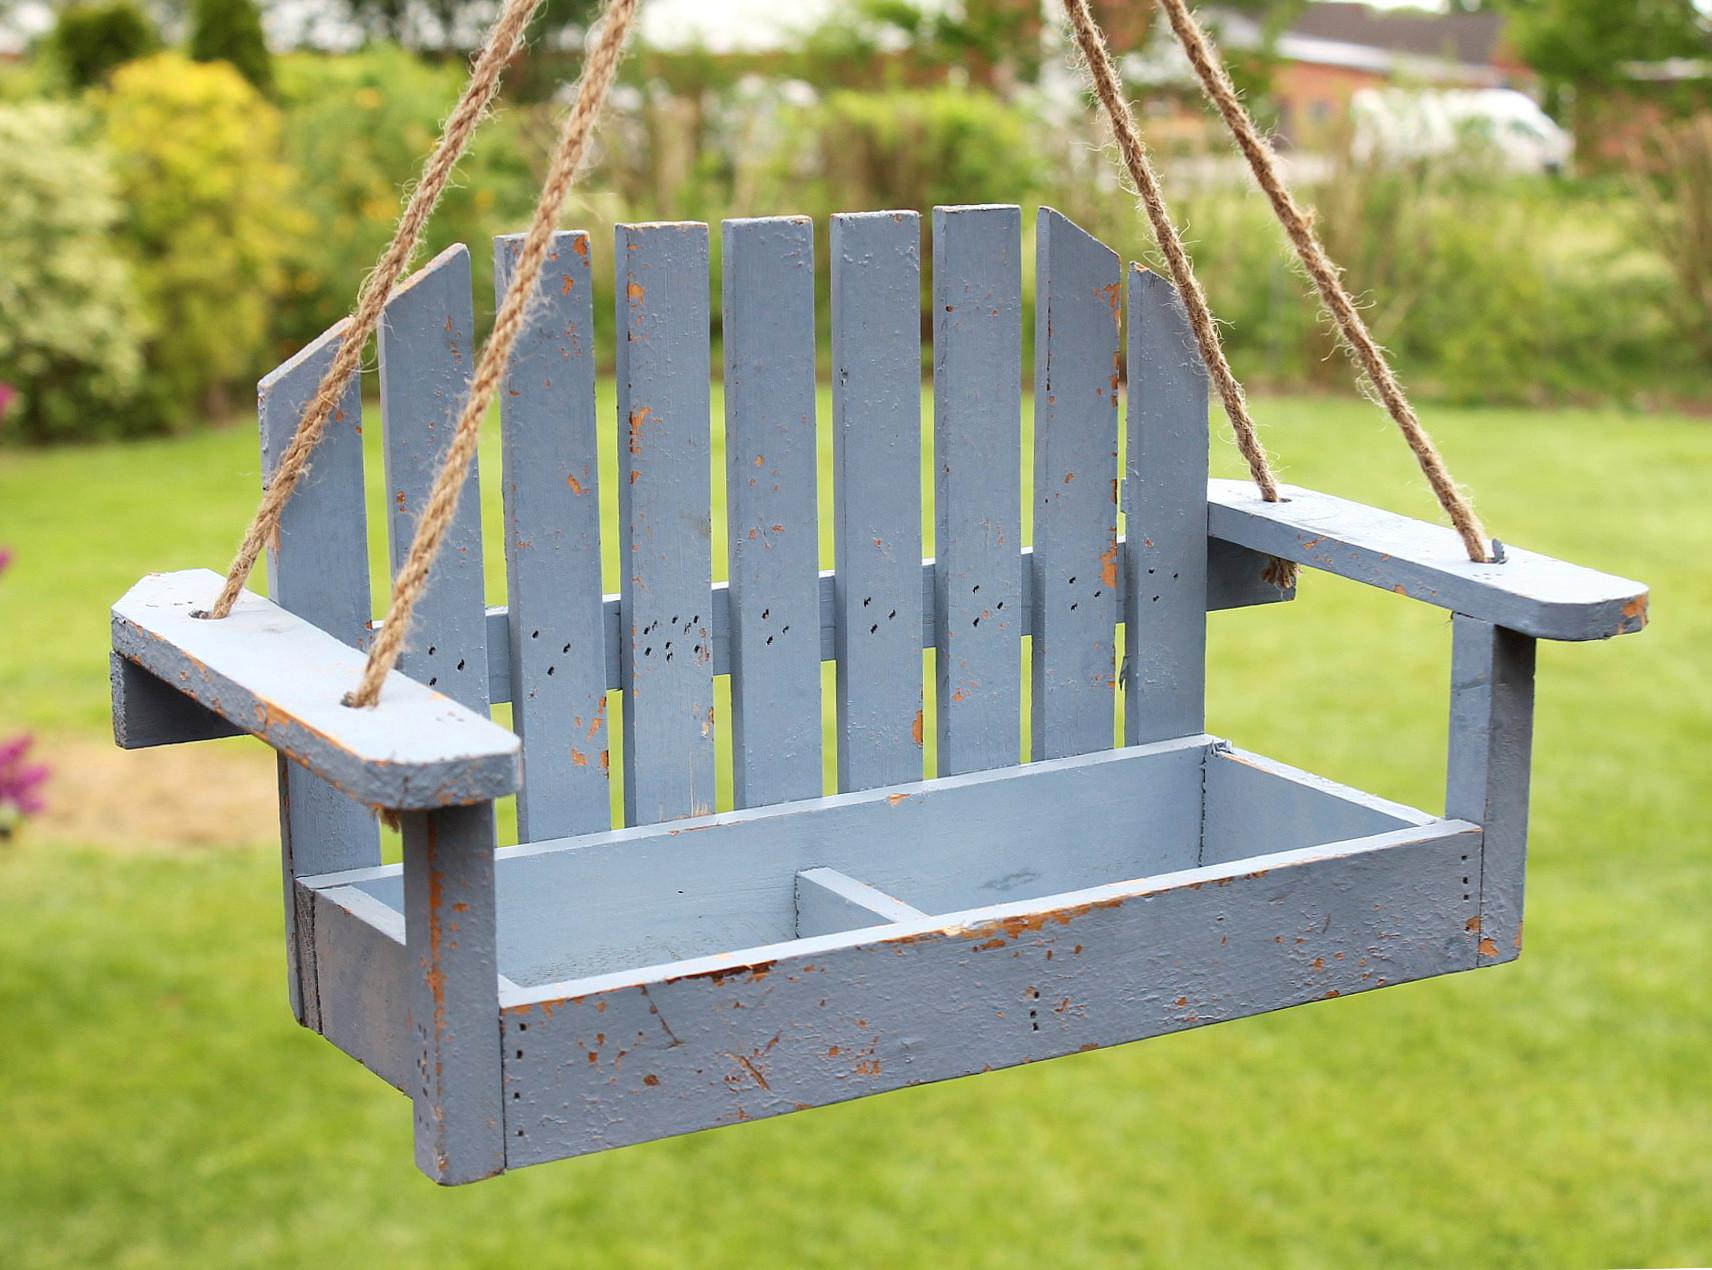 blumenampel schaukel 14b249 blau gartenschaukel 39cm. Black Bedroom Furniture Sets. Home Design Ideas